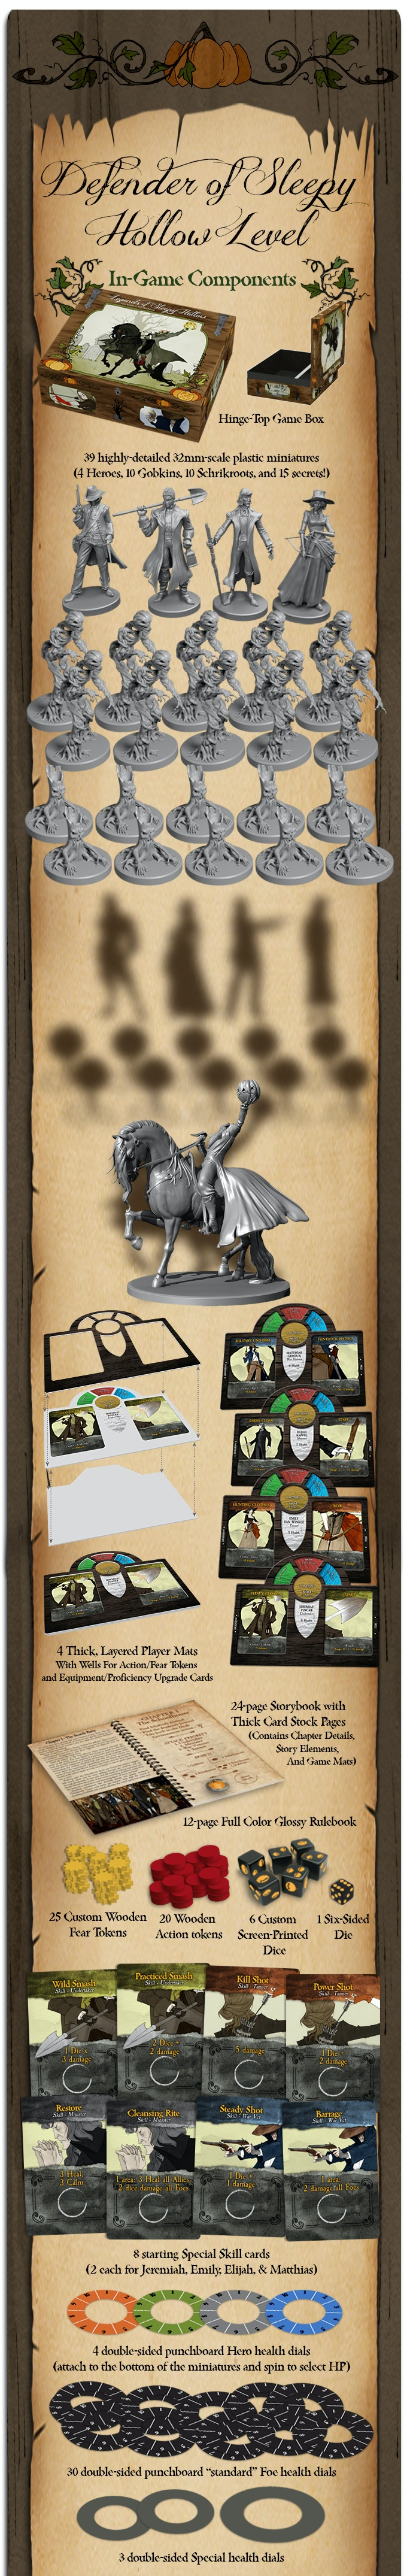 Legends of Sleepy Hollow by Dice Hate Me Games — Kickstarter